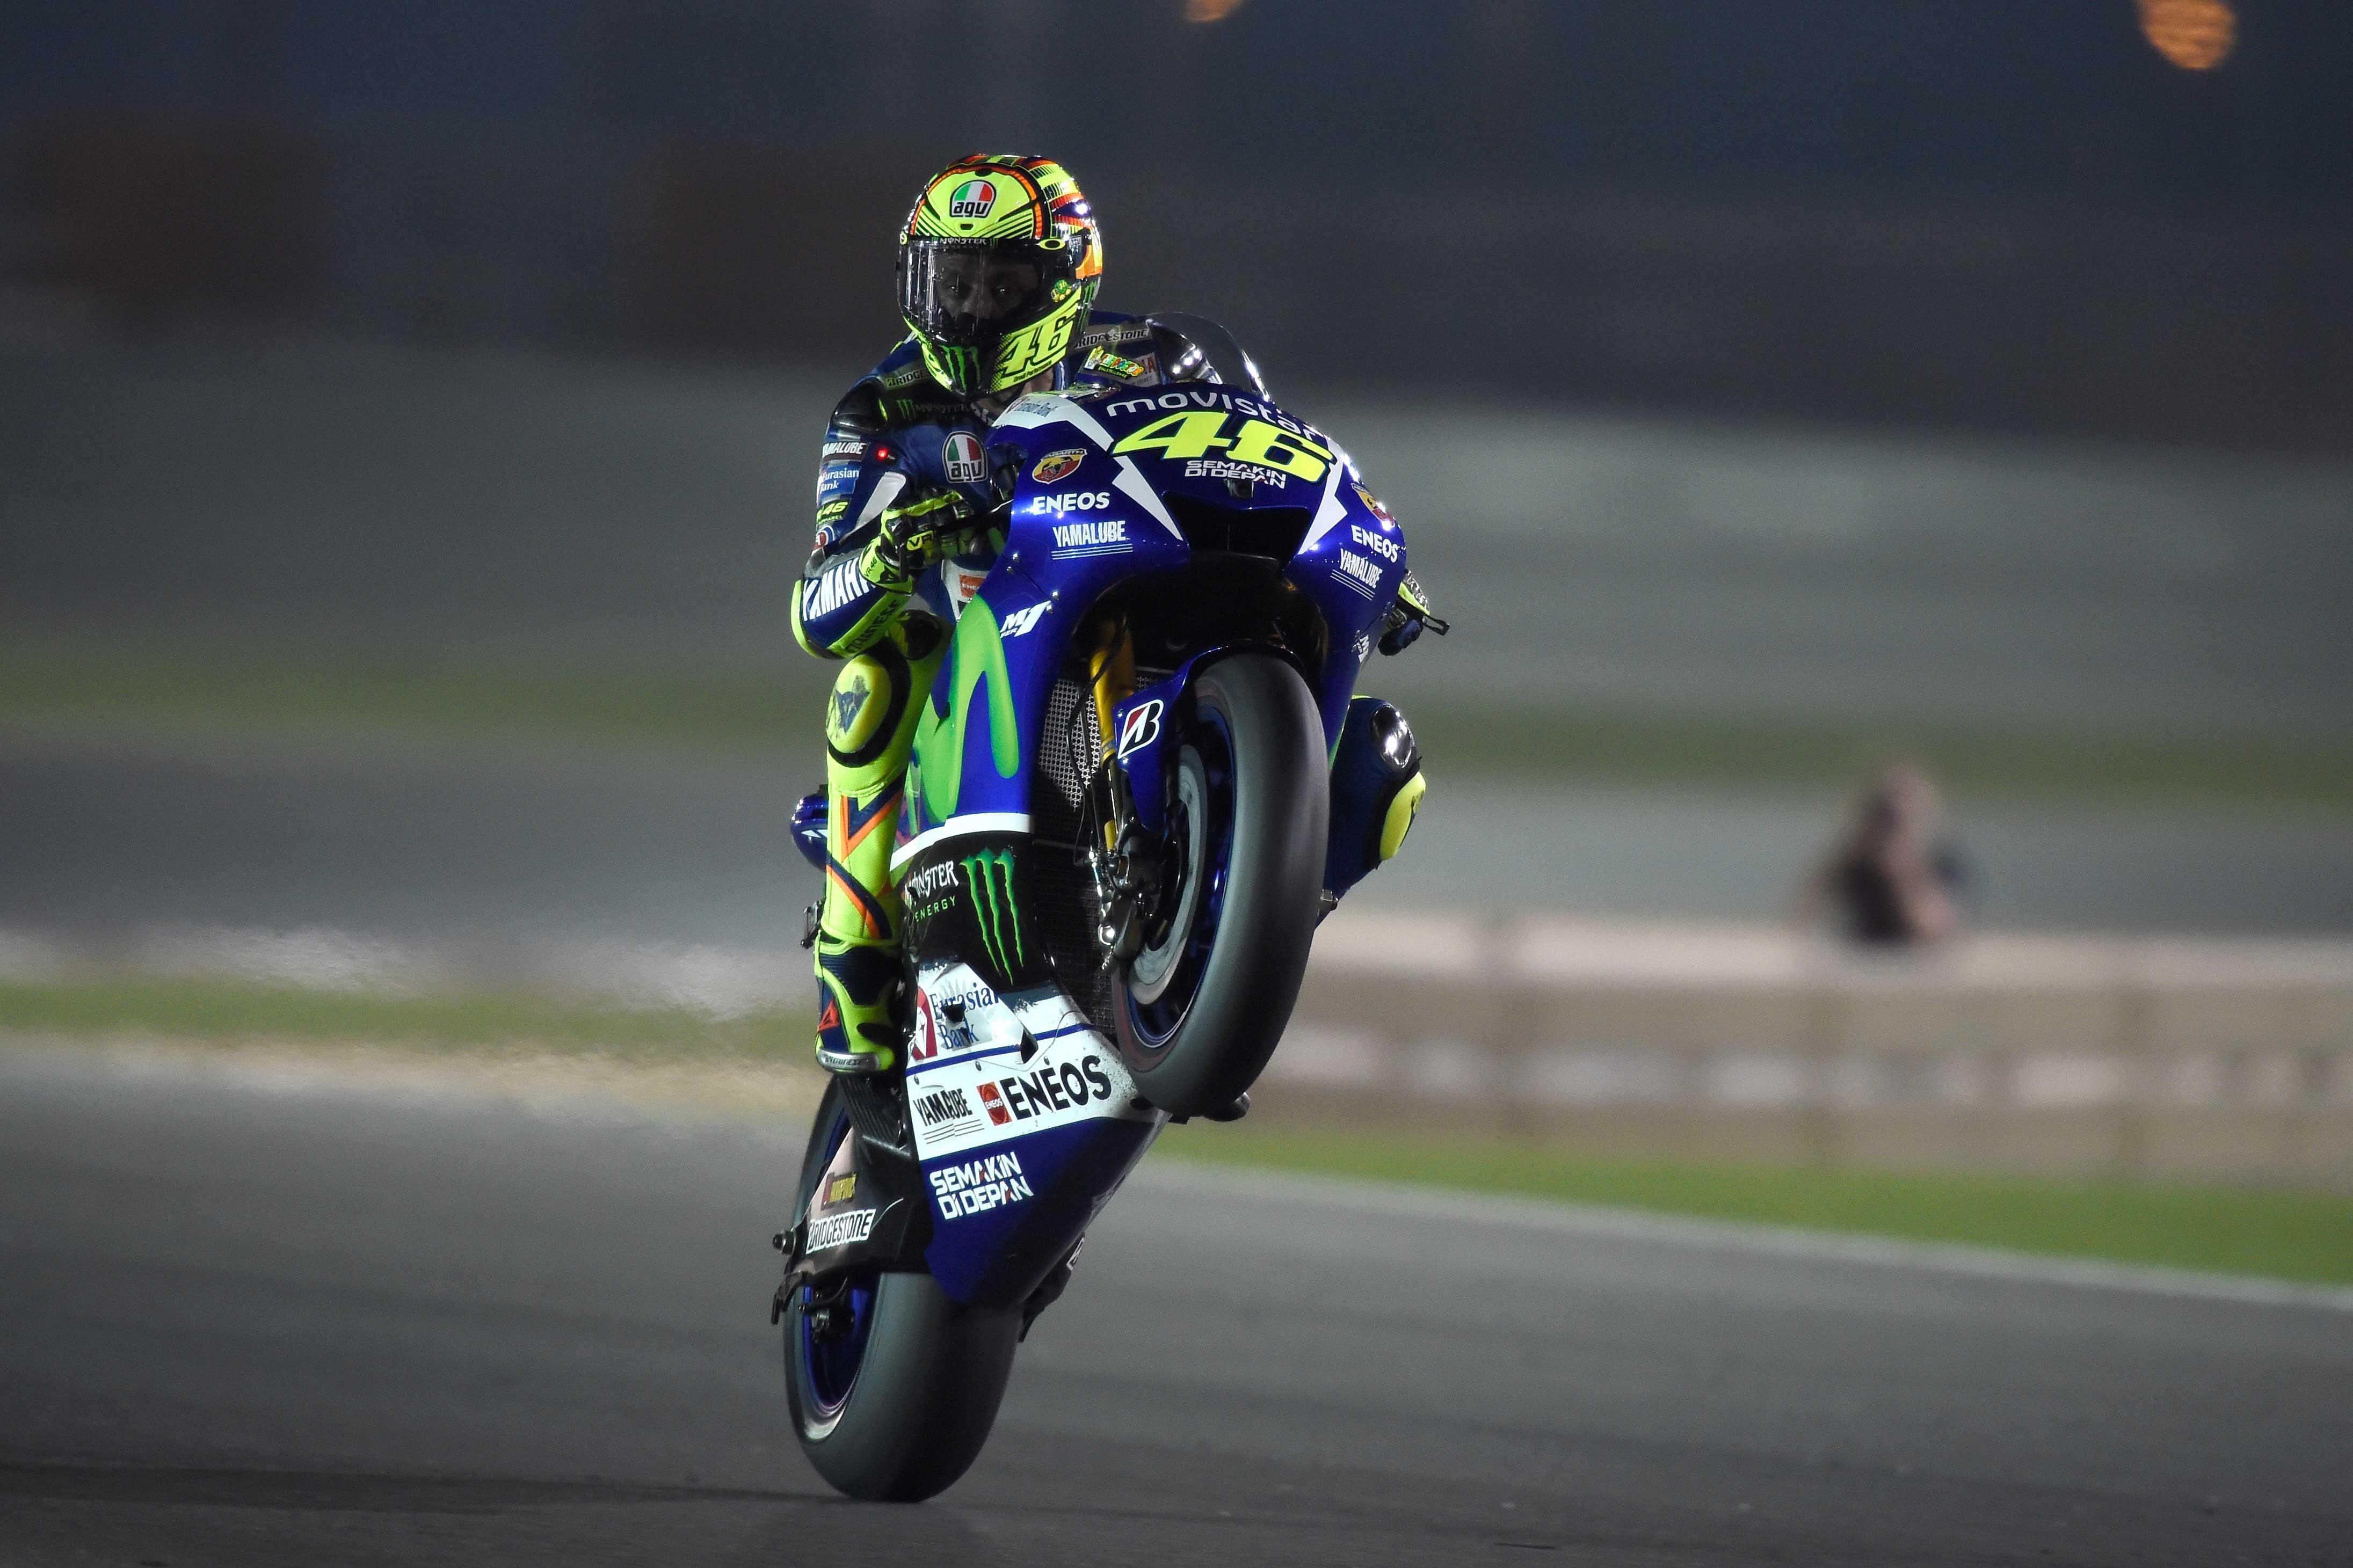 Valentino Rossi Wallpaper Jump MotoGP 4382x2921